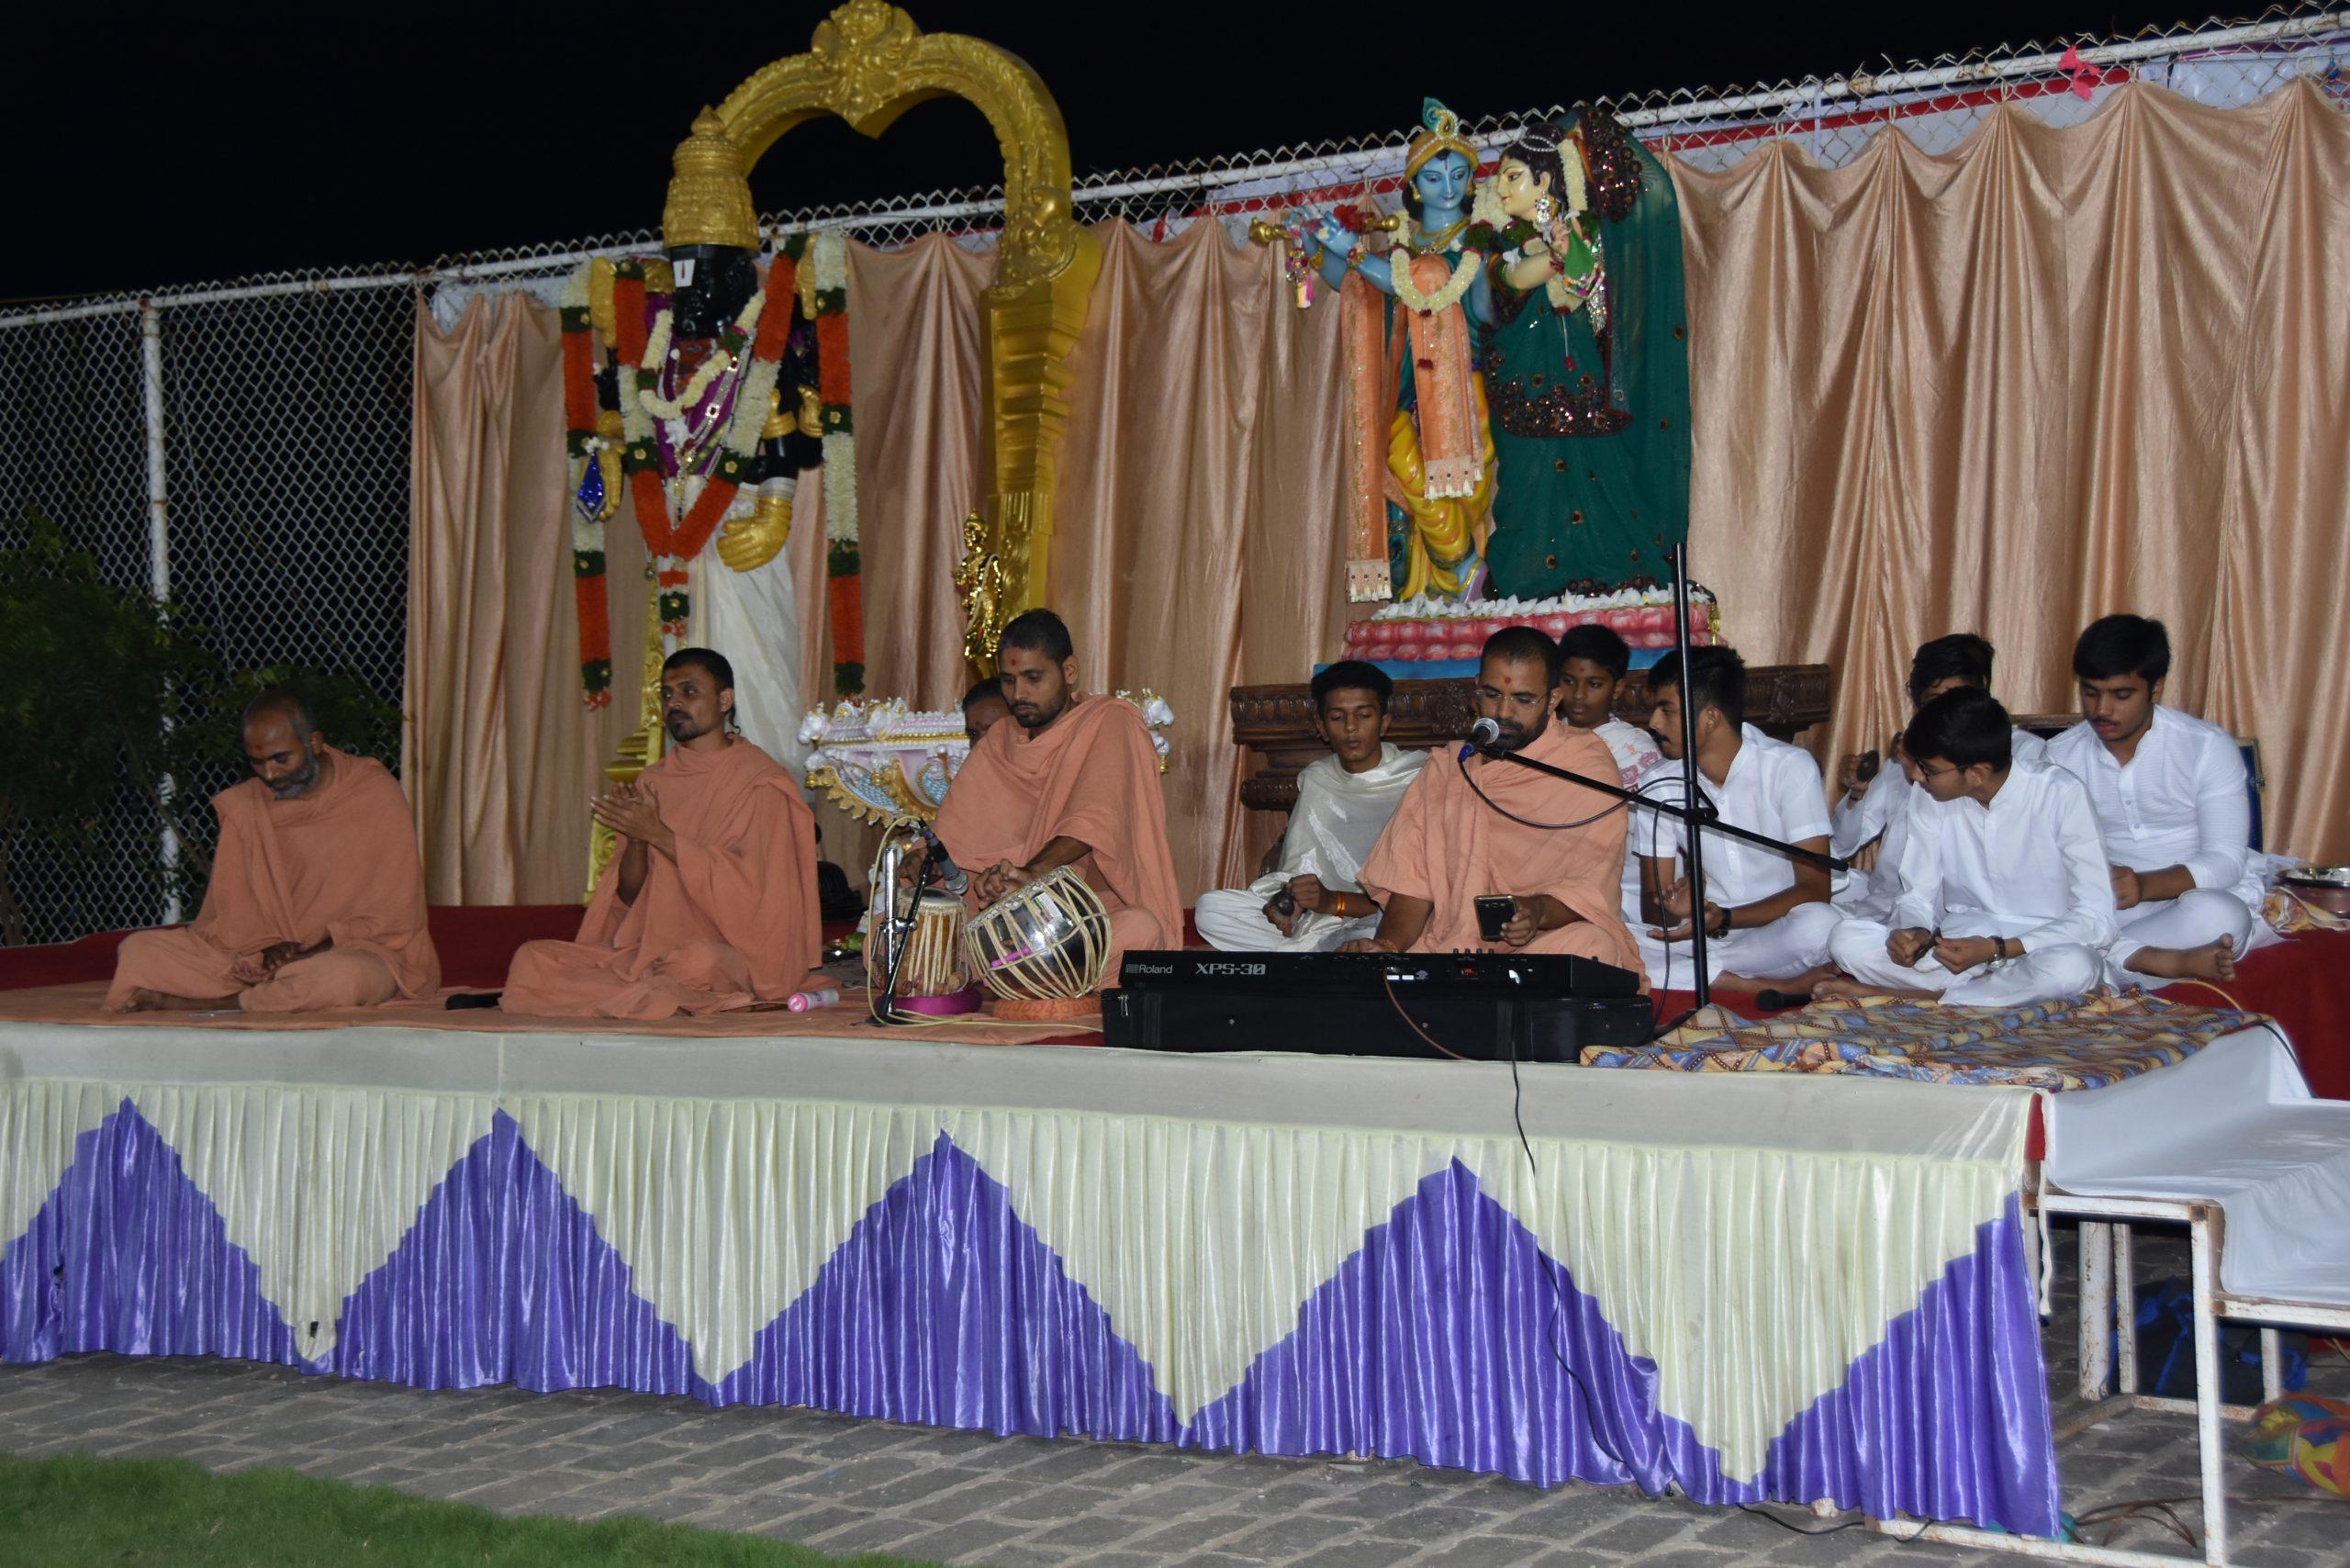 SHREE NEELAKANTH VIDYAPEETH Bhajan by Saints and Students